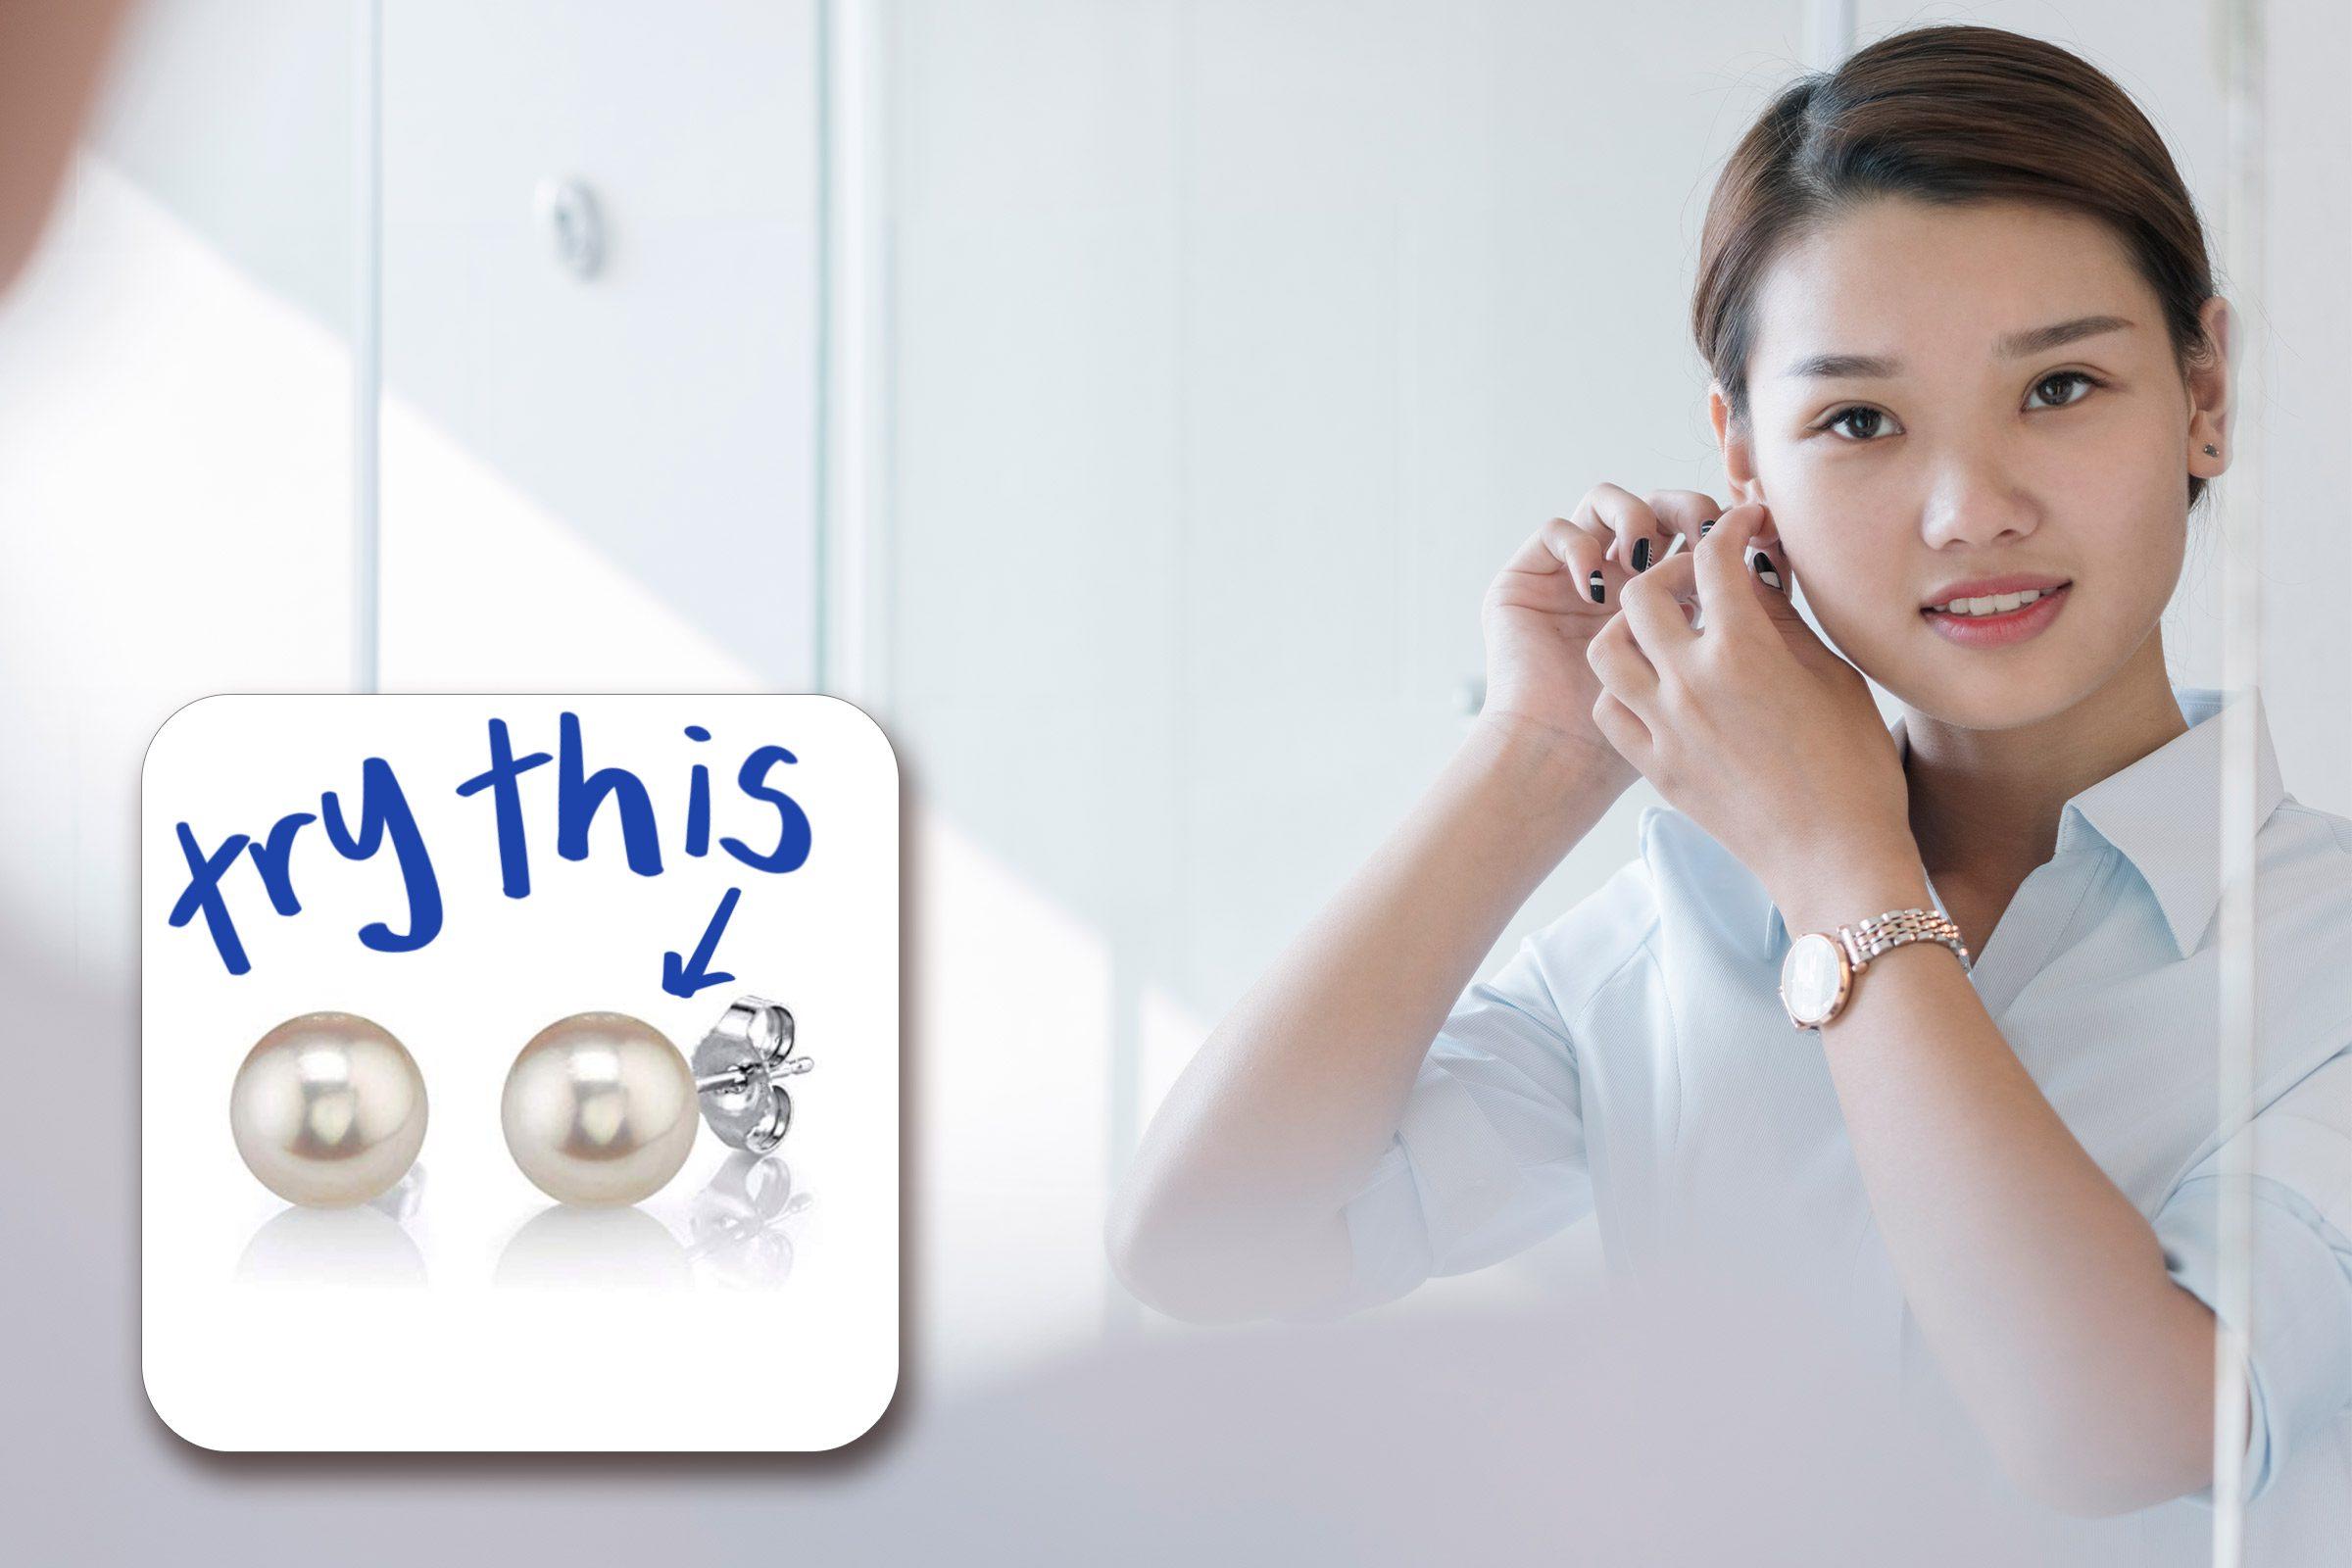 woman putting in earrings in the mirror